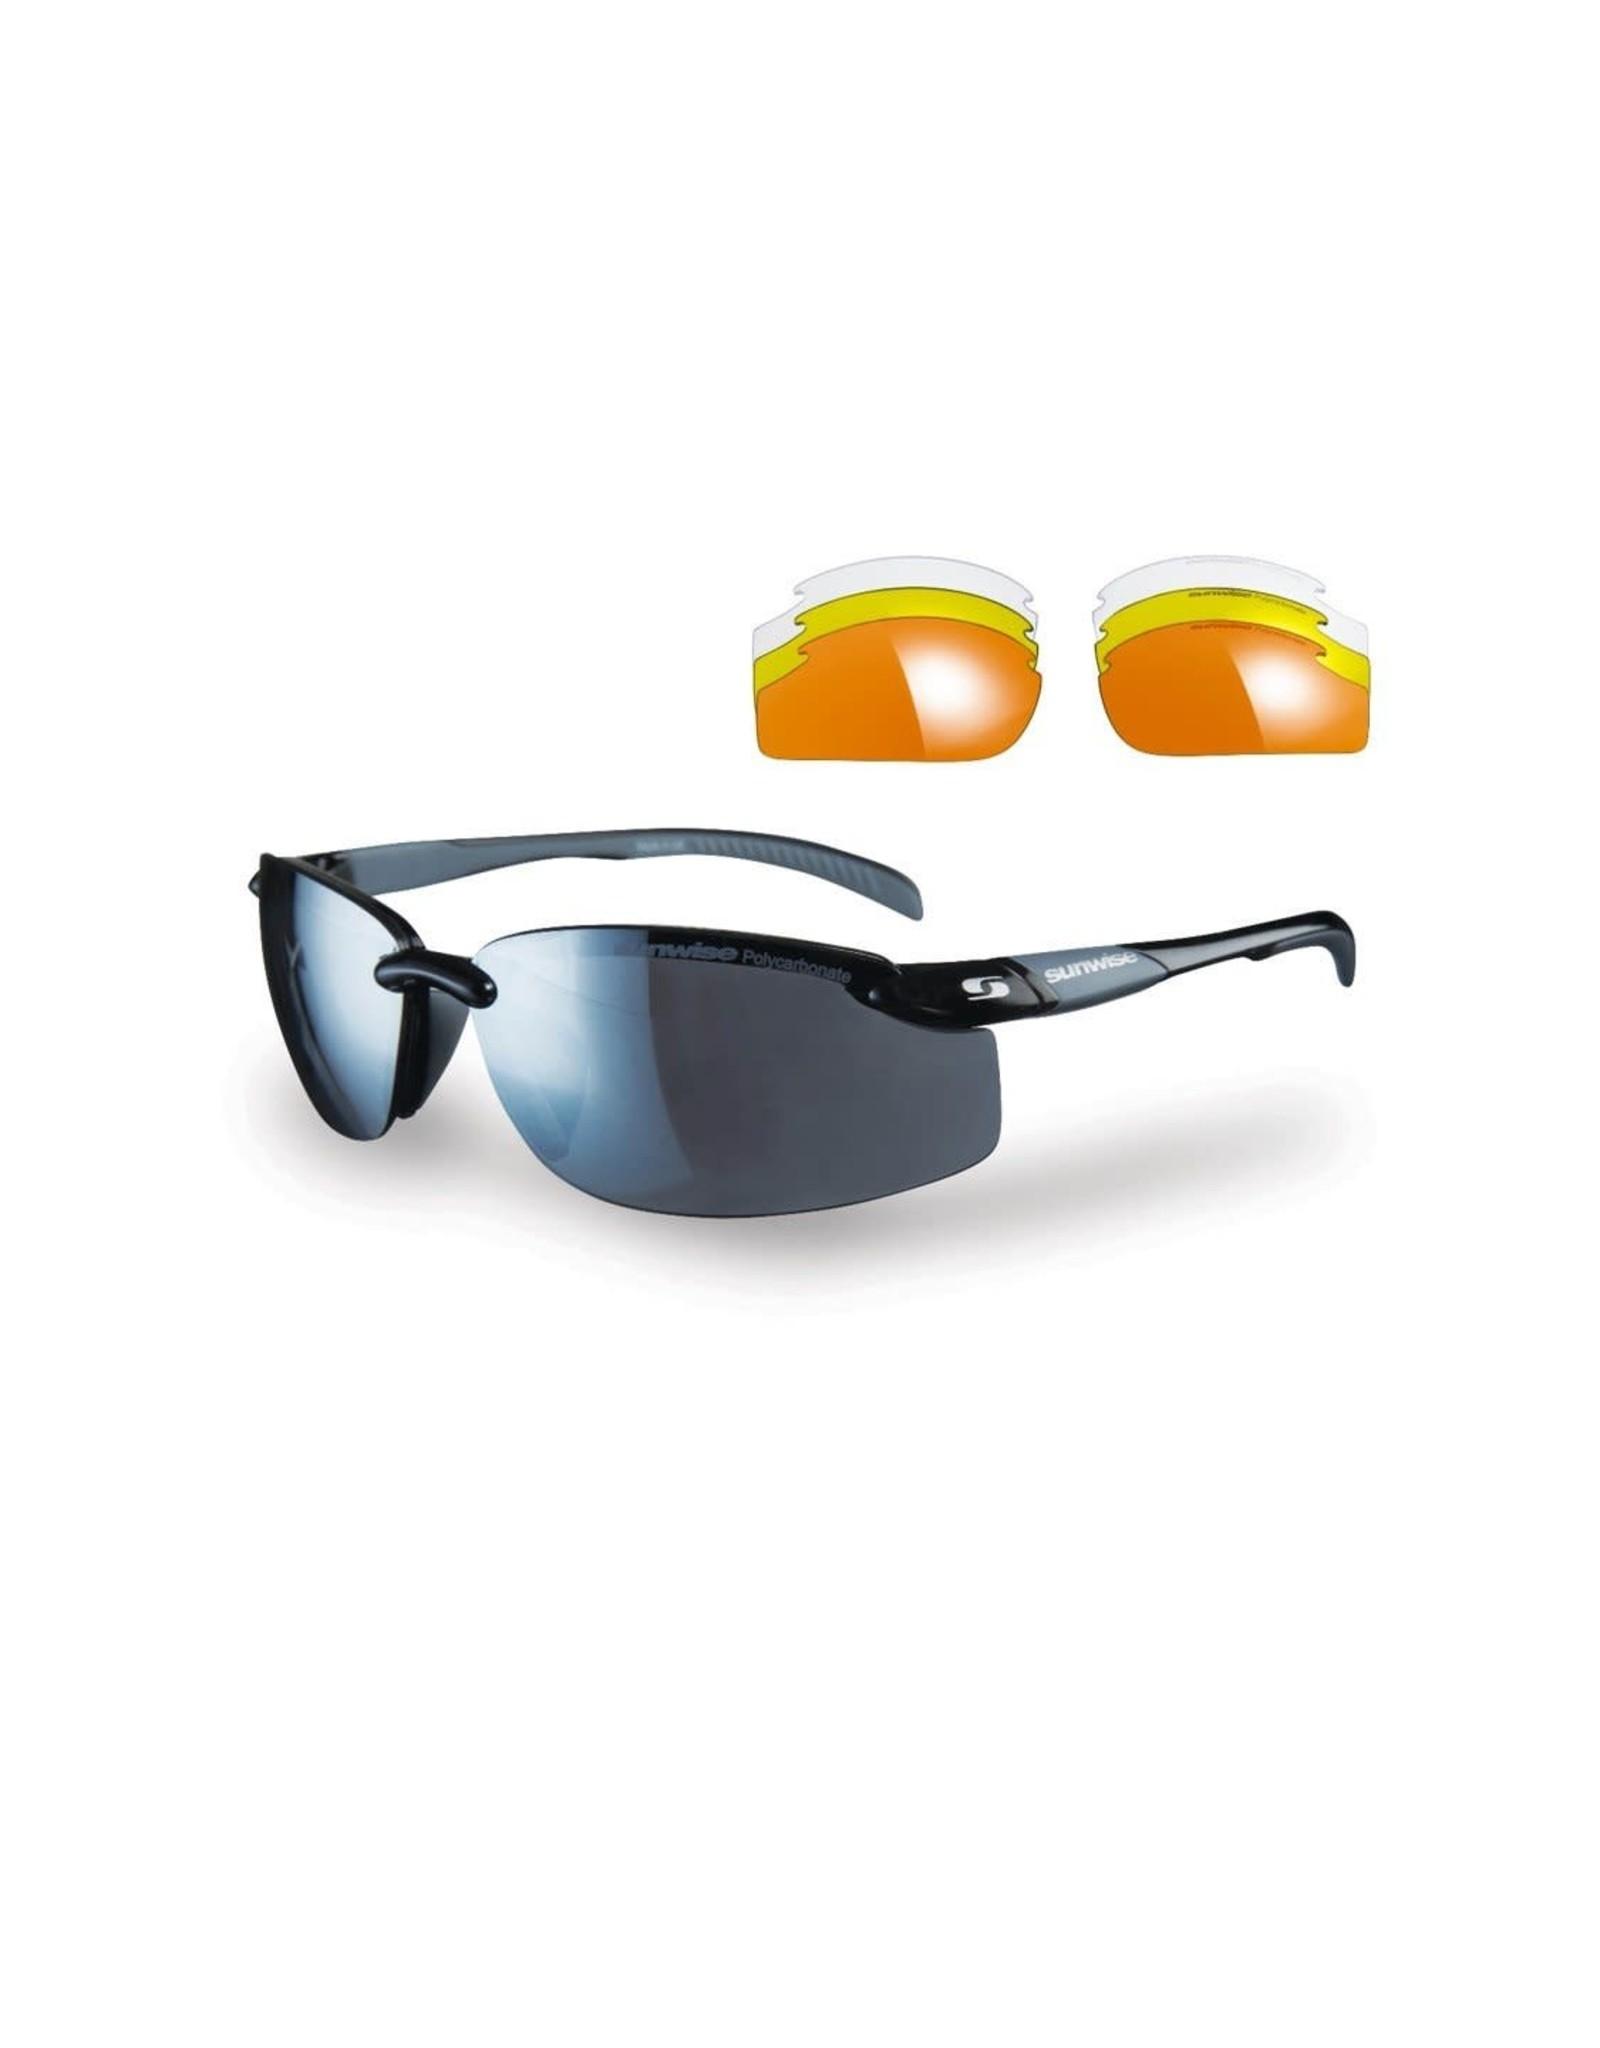 Sunwise Pacific Sunglasses Black